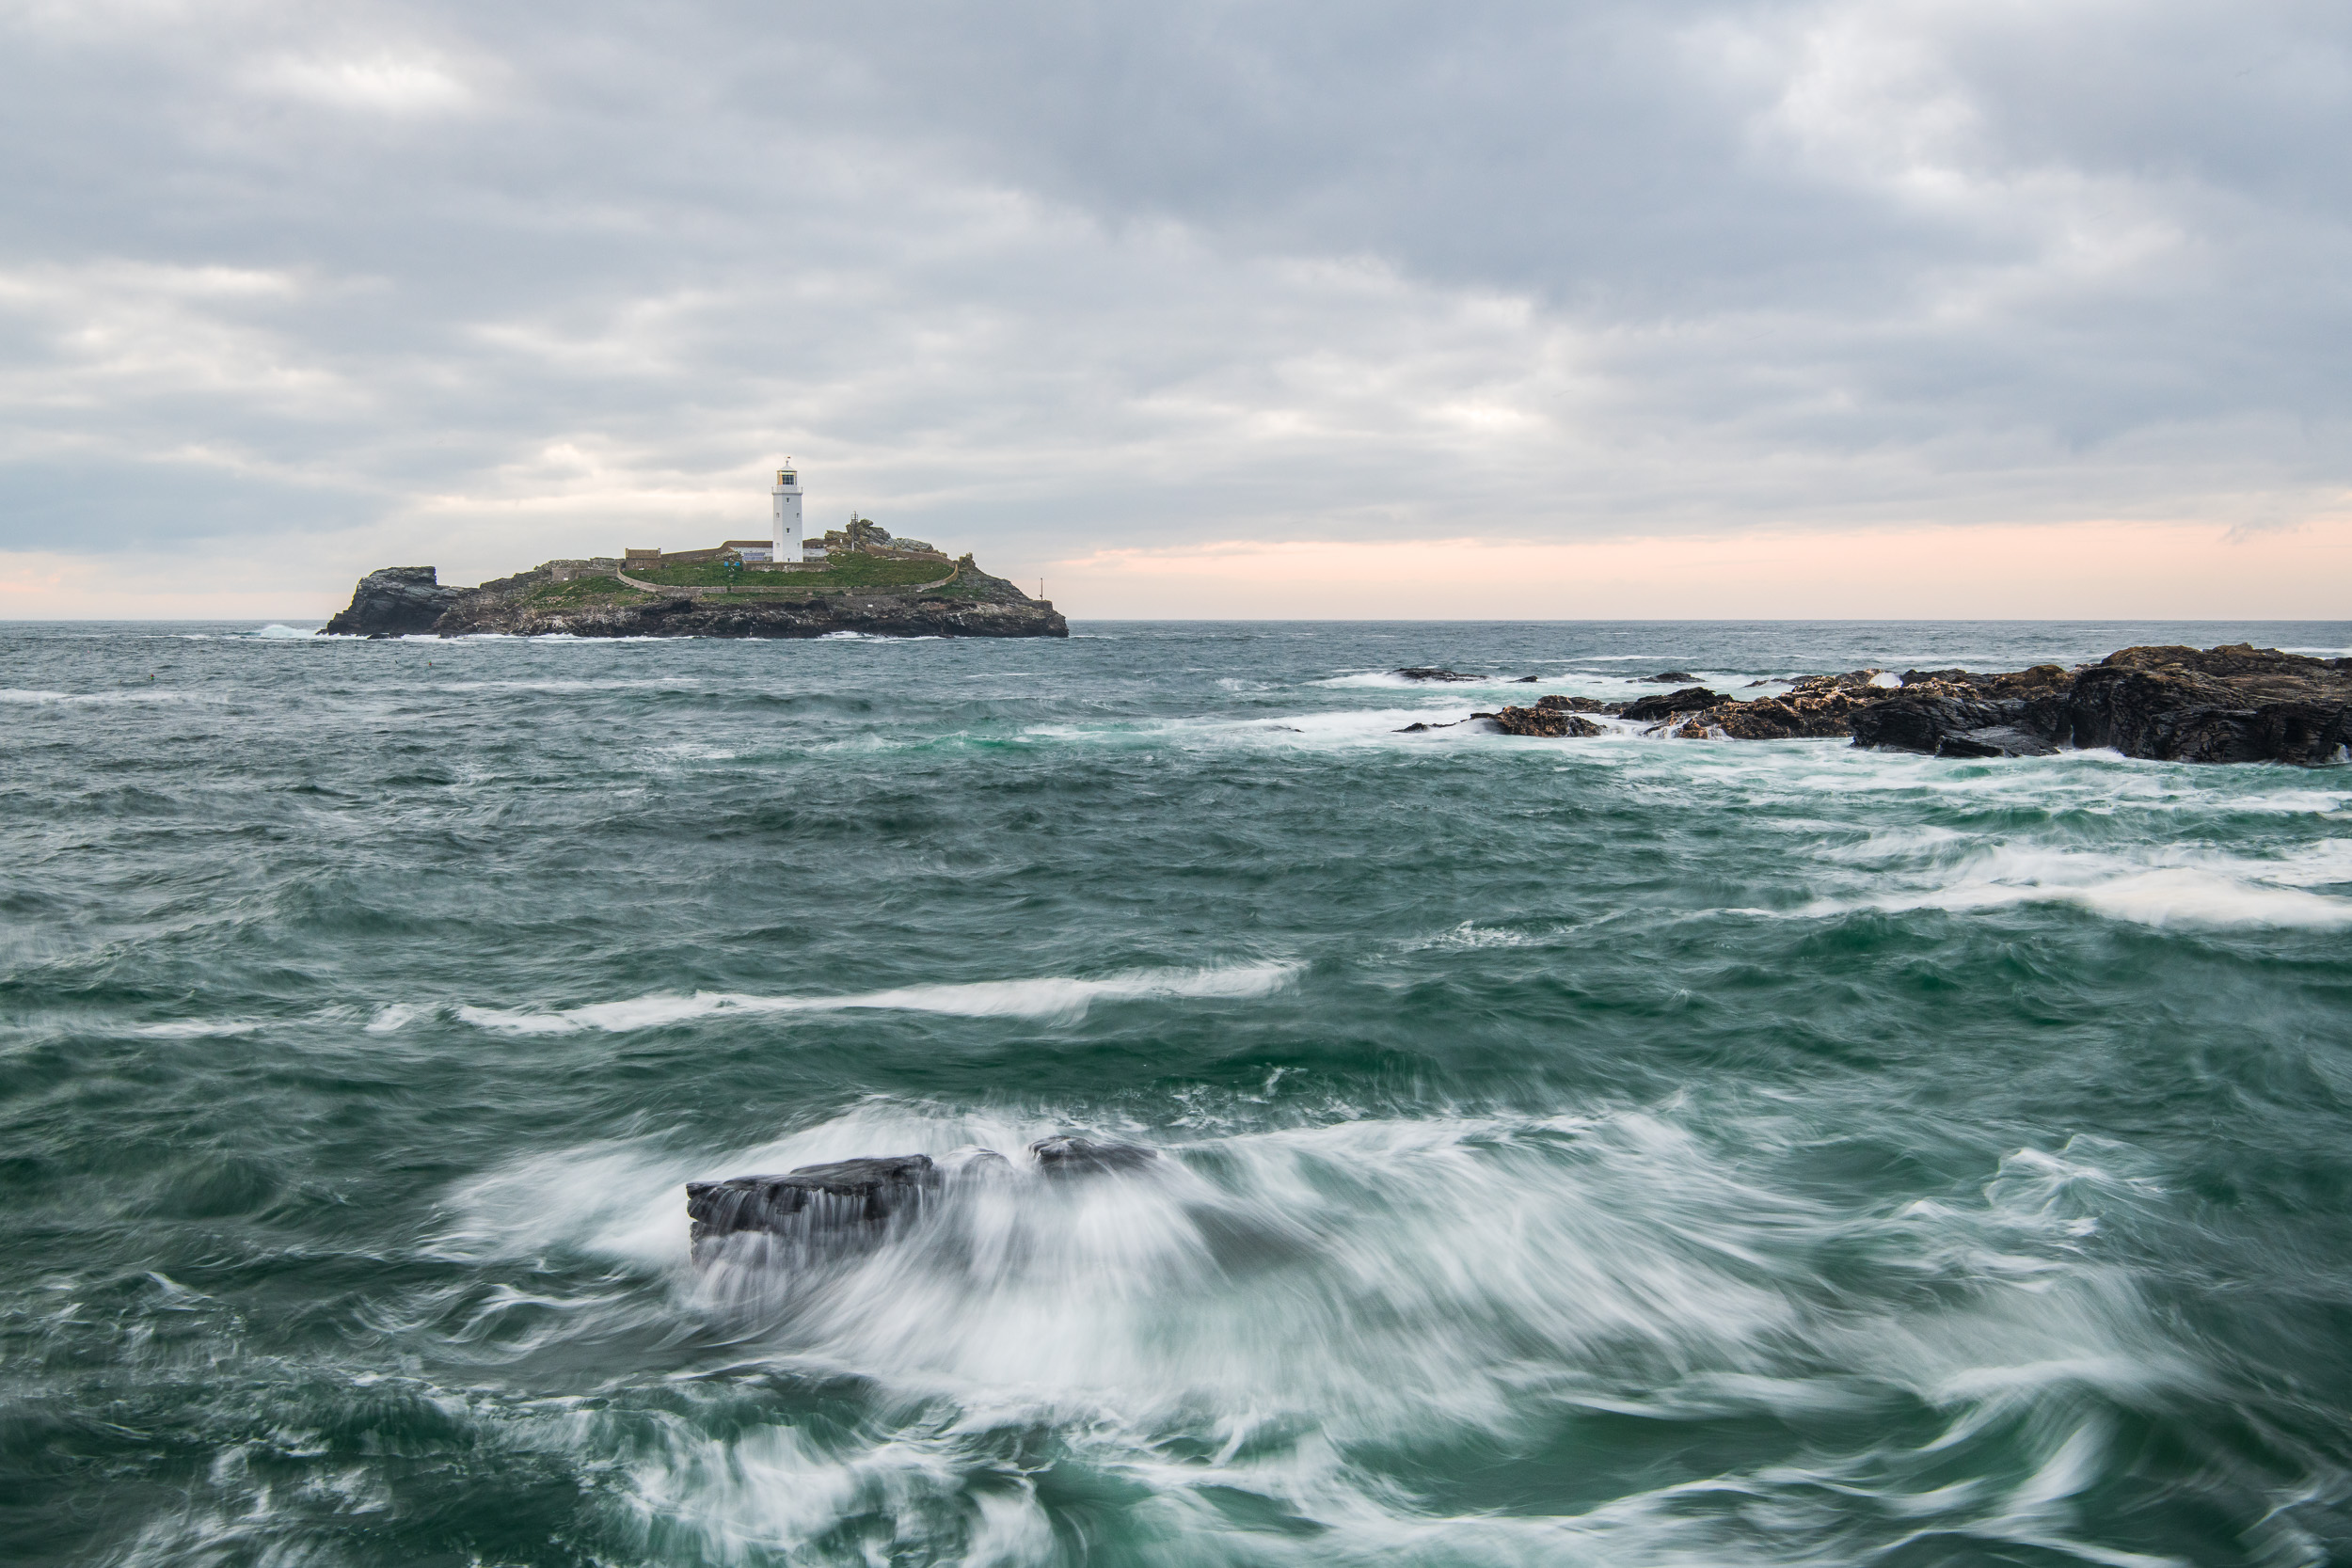 Godrevy Lighthouse from Godrevy Point, Cornwall  - Nikon D850, Nikkor 24-70 mm f/2.8 VR at 38 mm, f/13, 0.5 sec @ ISO 400, Lee Filters Landscape Polariser.